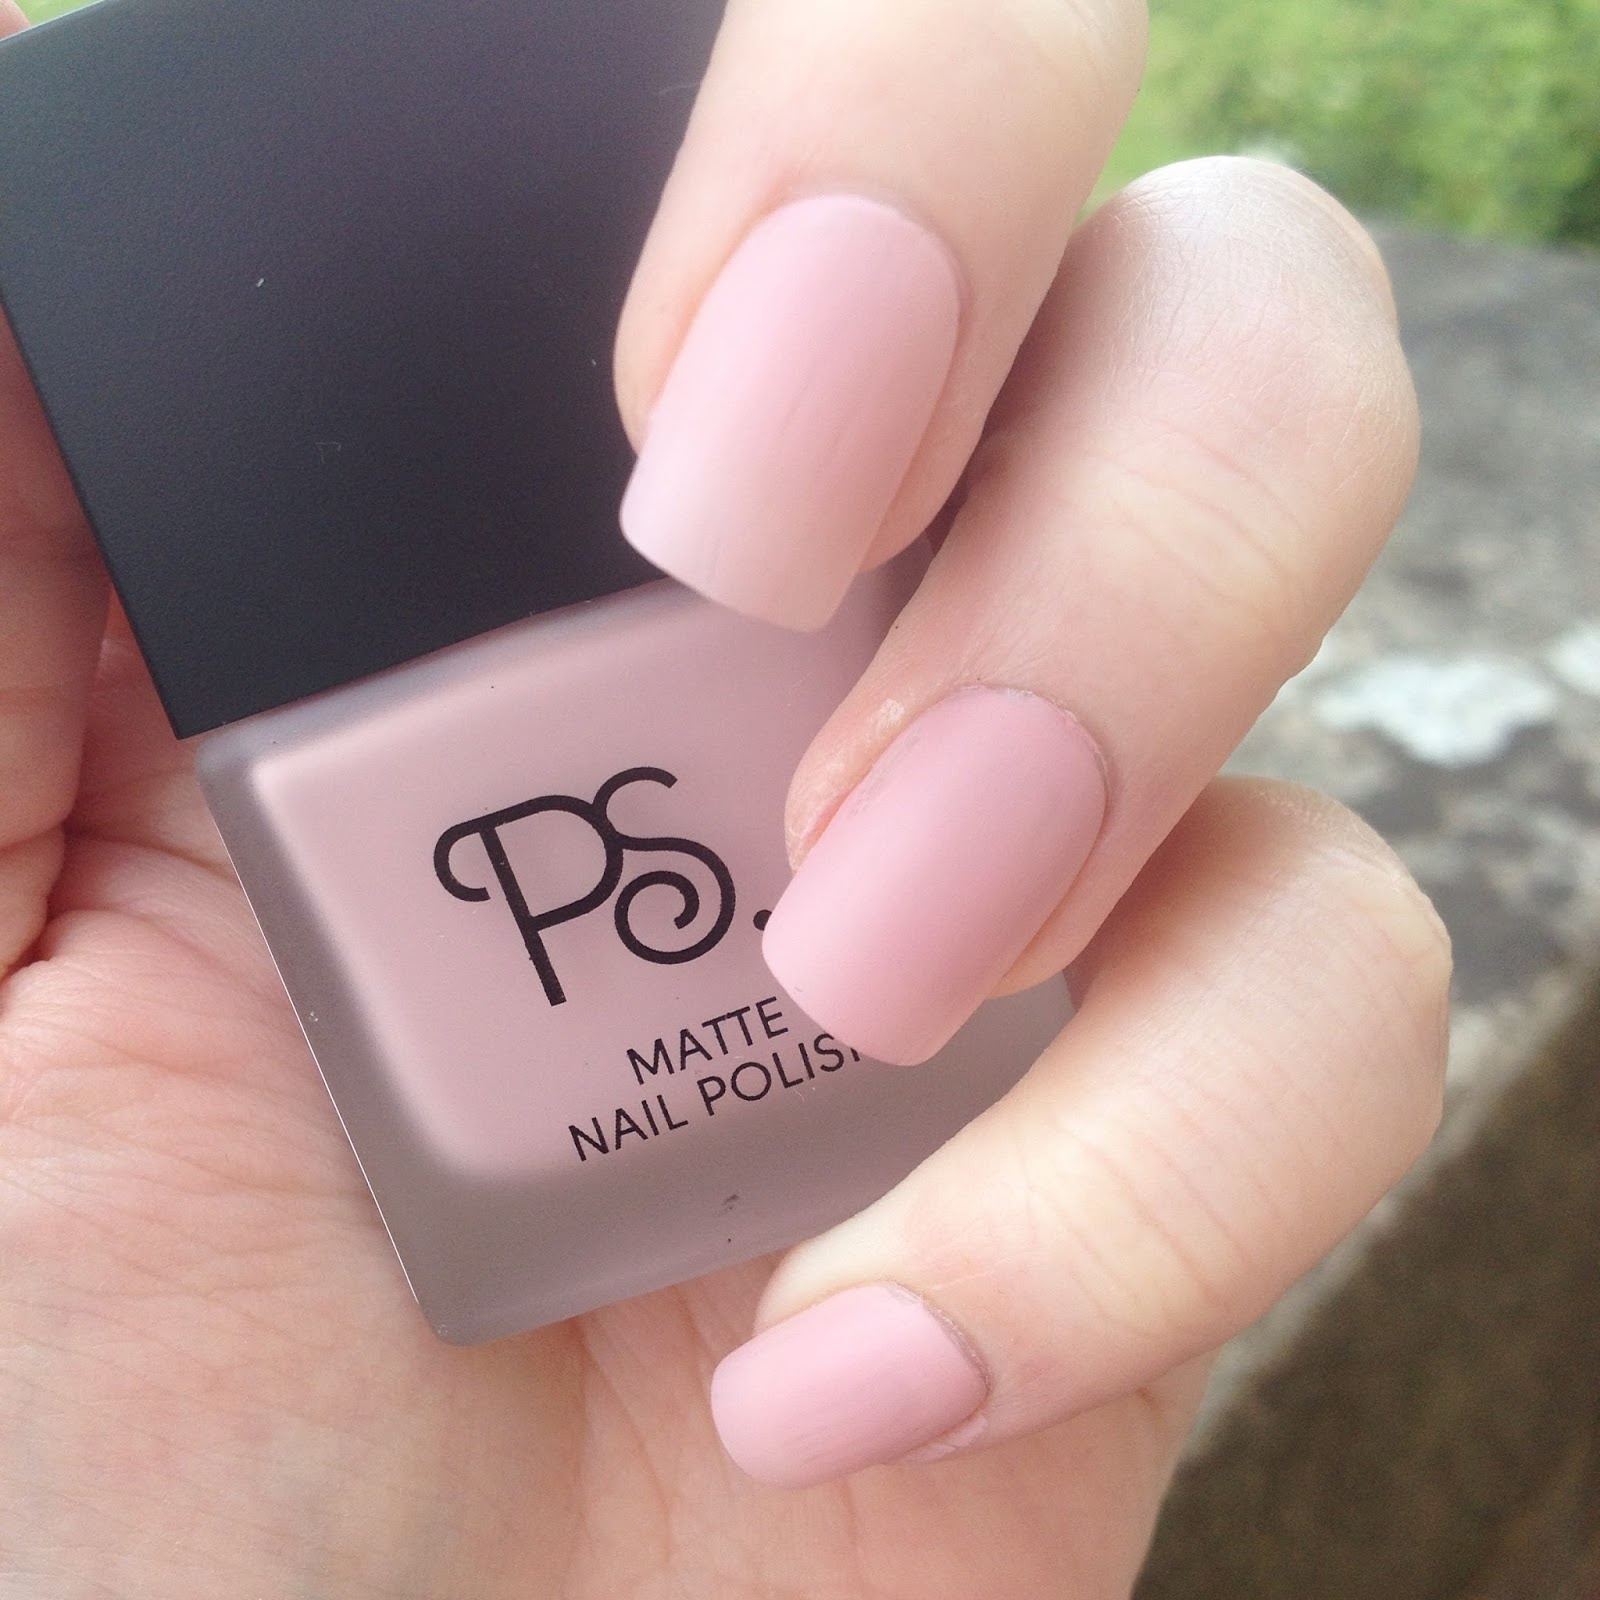 Nail Polish Primark Review- HireAbility